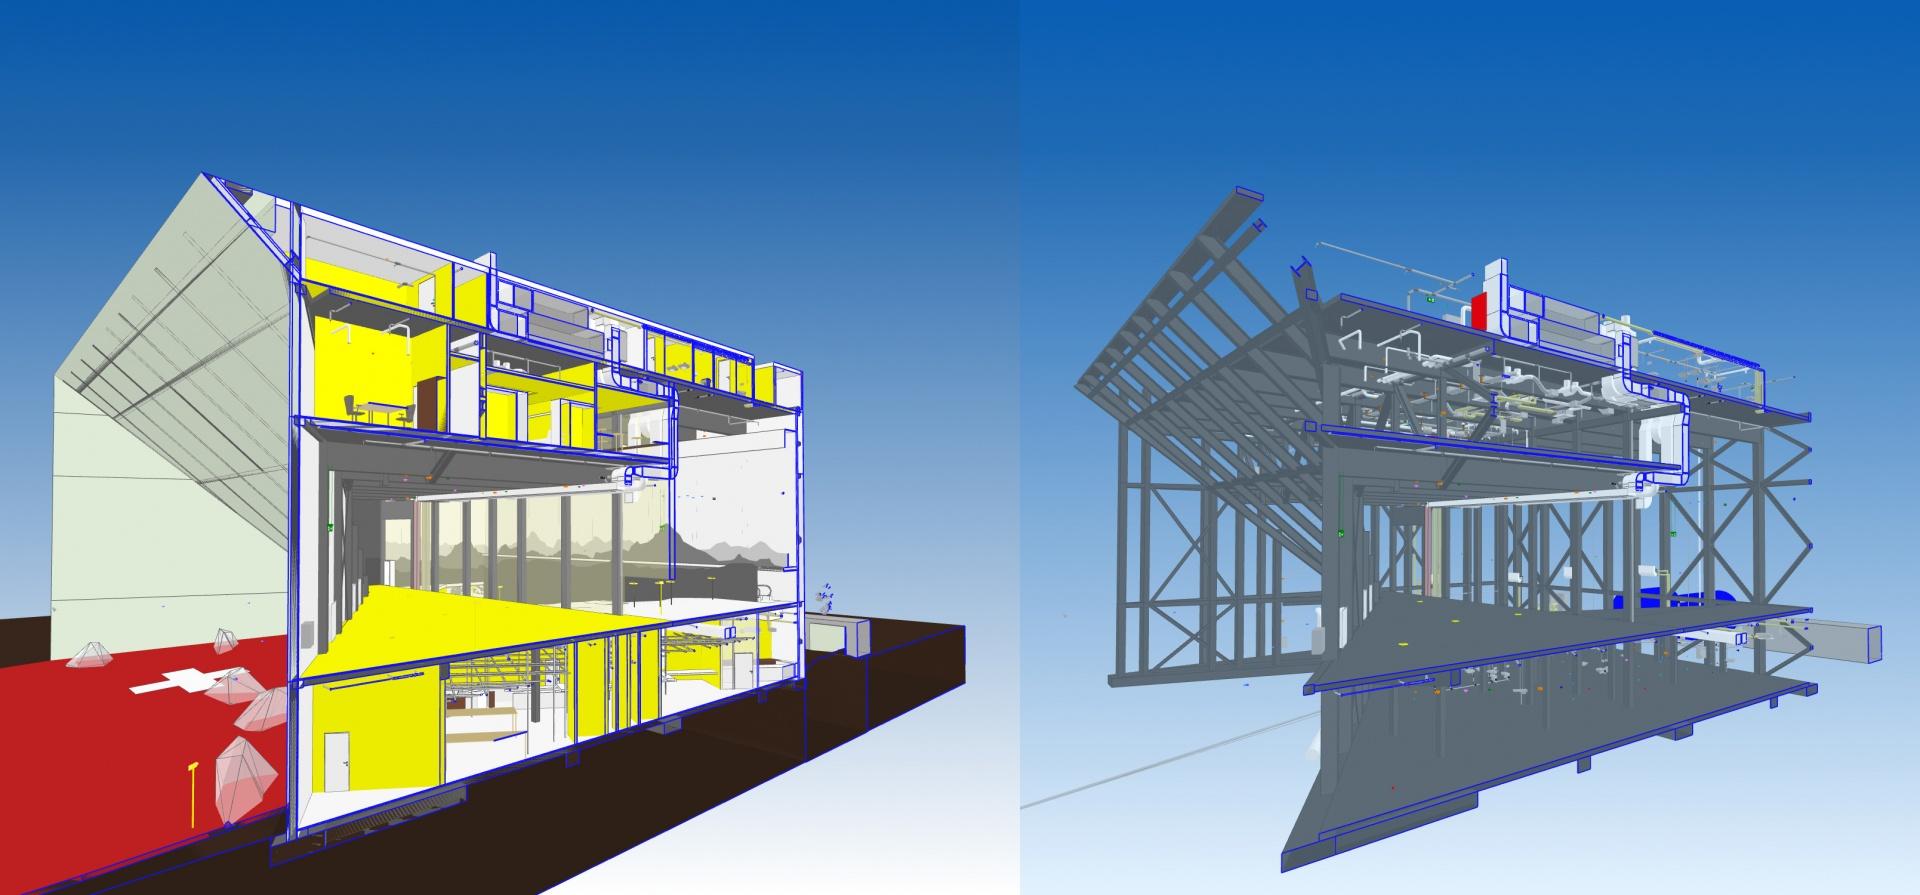 Kommunikationsmodell Schnittmodell Gesamt und Tragwerk-Haustechnik © OOS AG